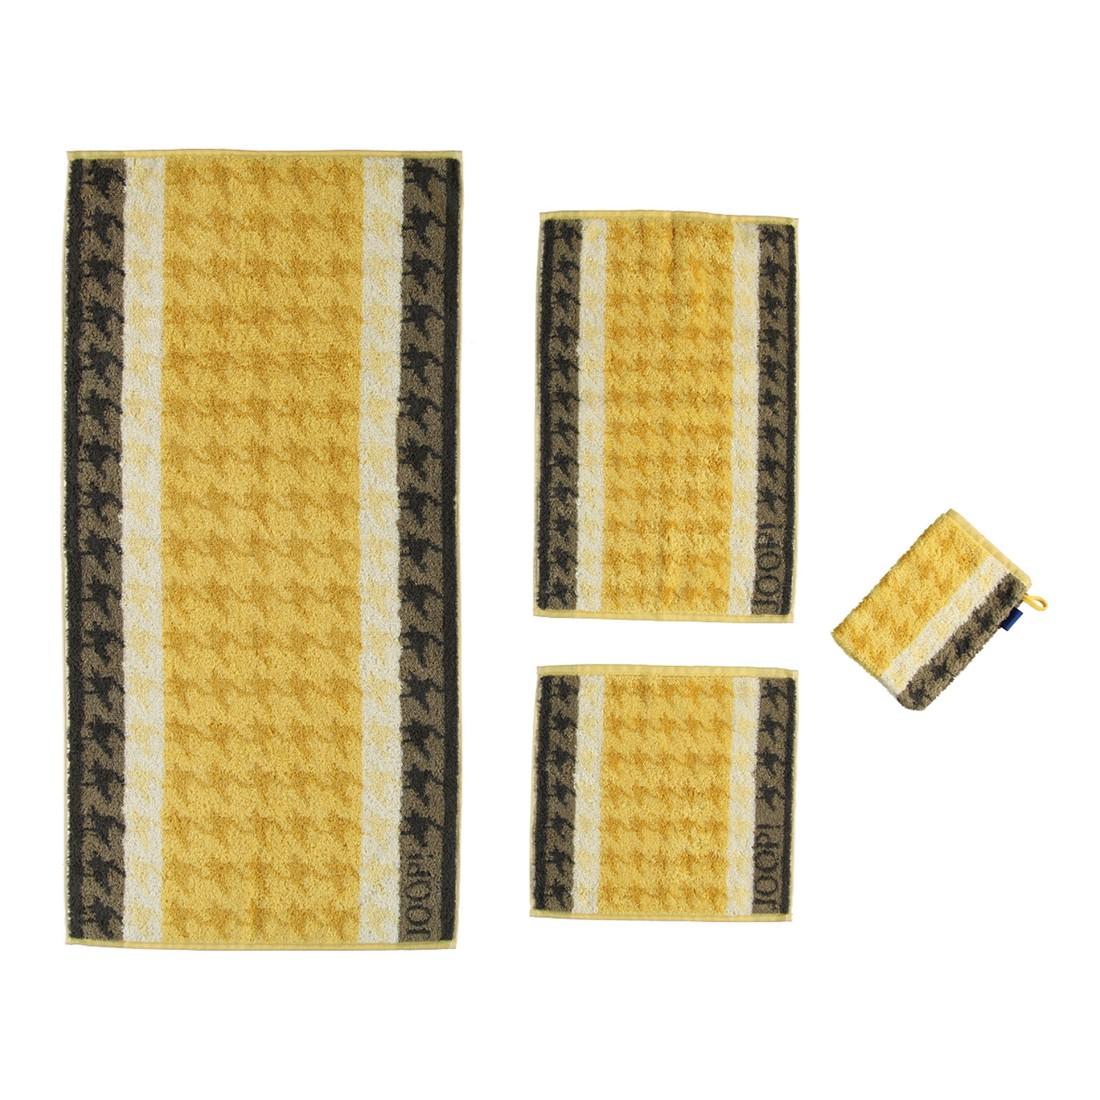 Handtuch Elegance Graphic – 100% Baumwolle messing – 55 – Seiflappen: 30 x 30 cm, Joop online bestellen